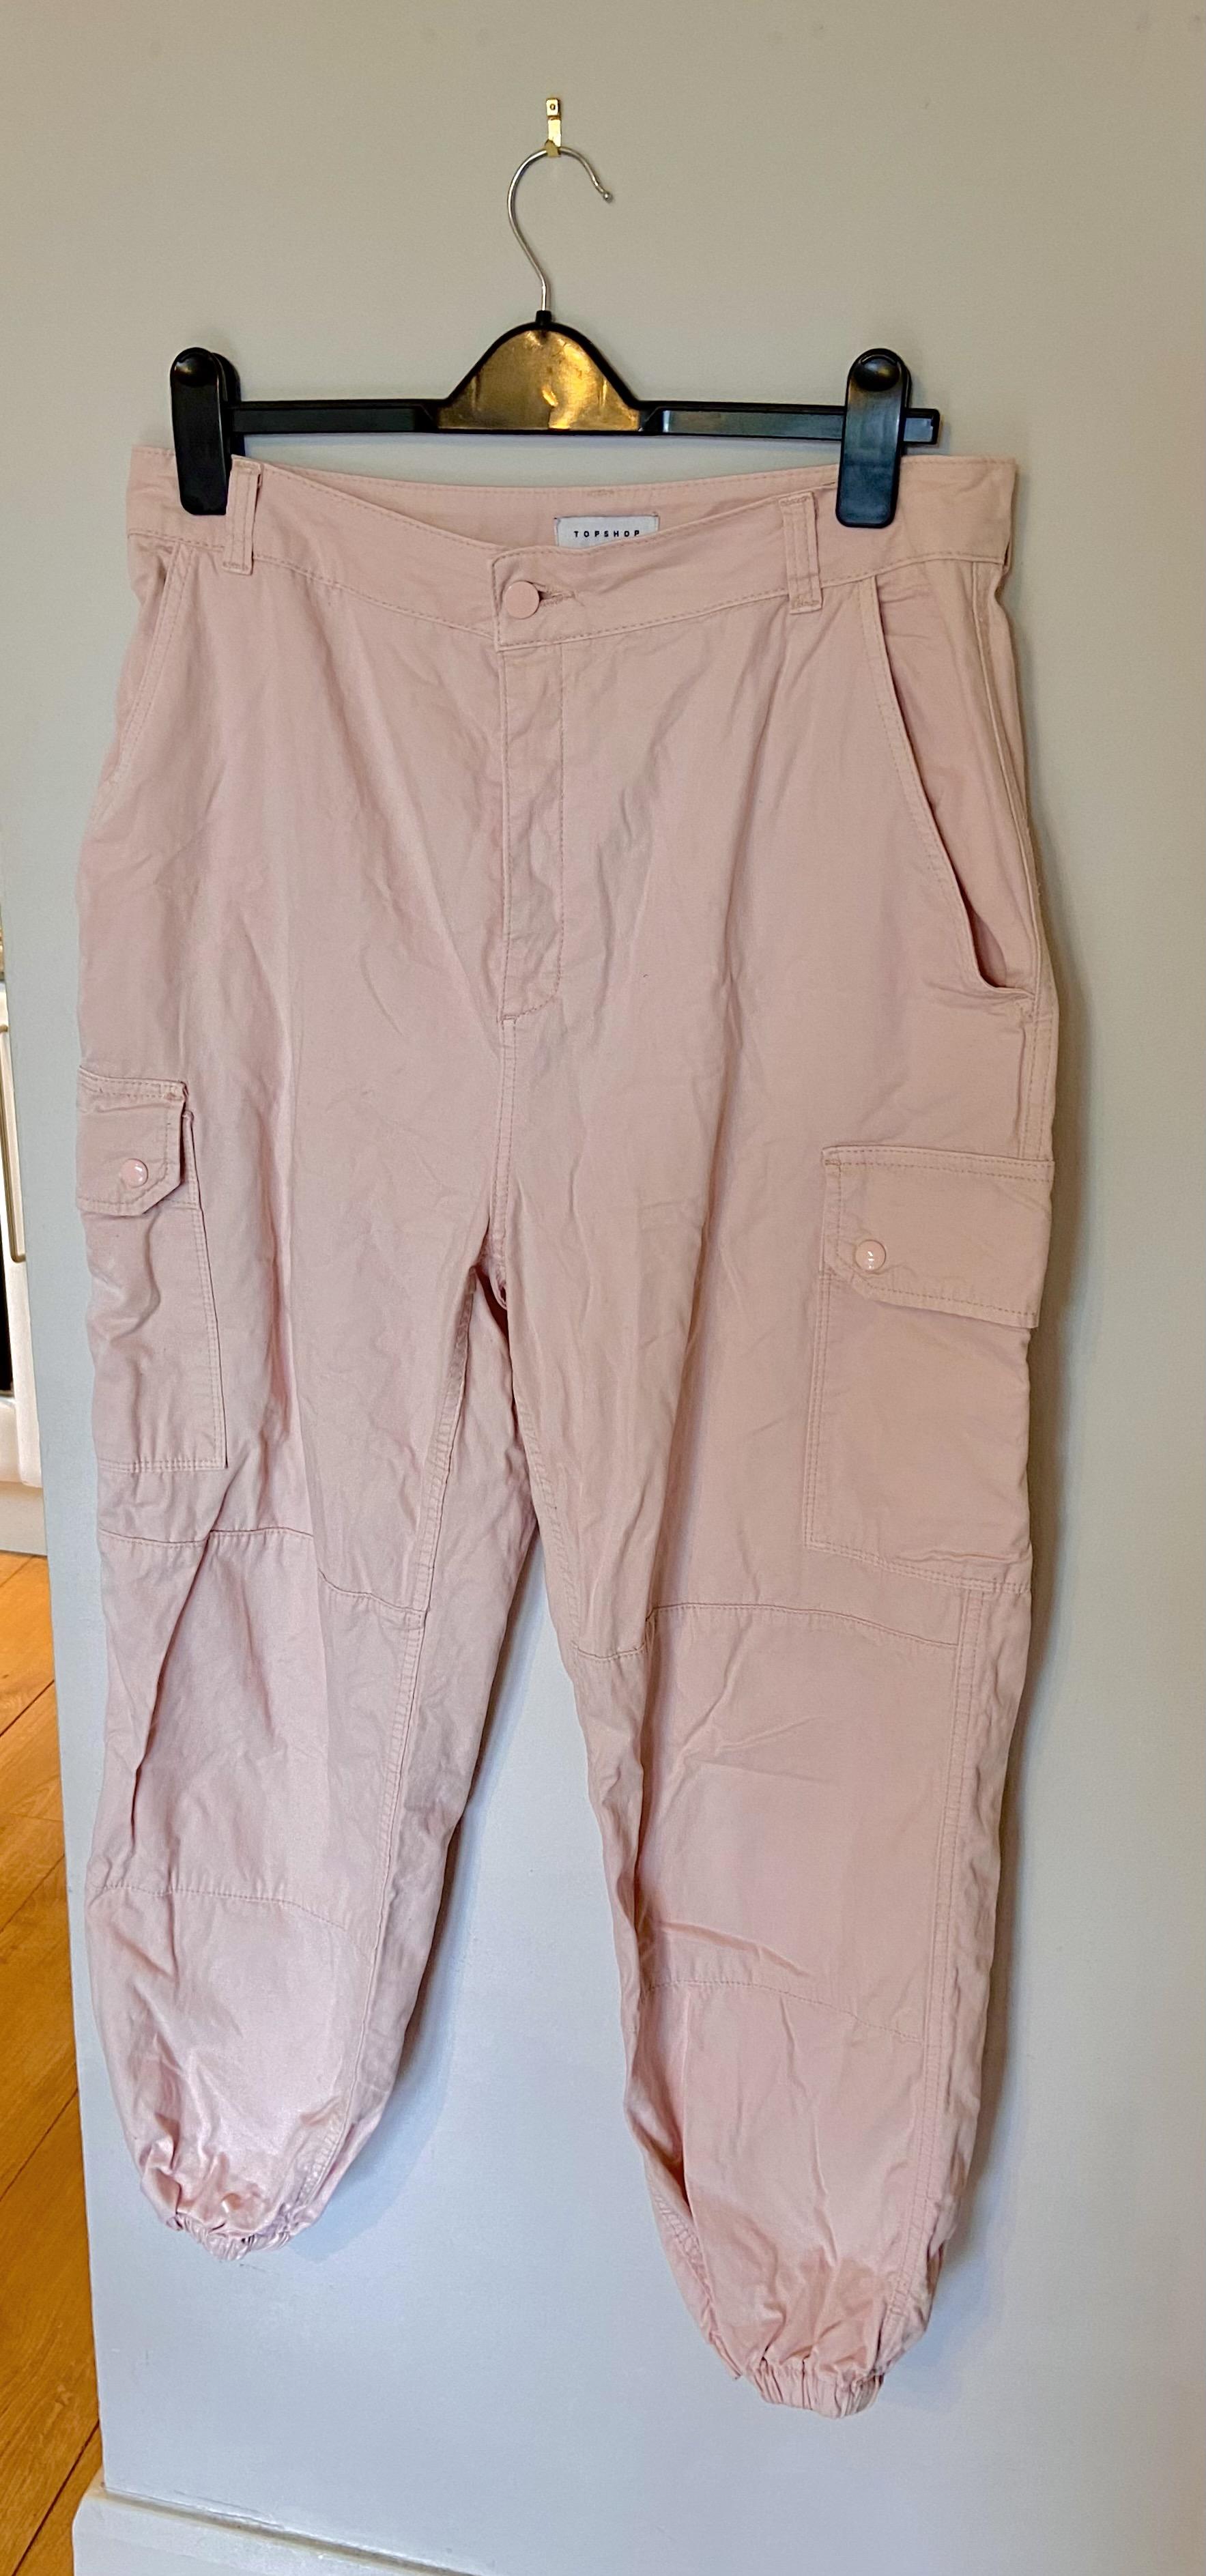 Image of Topshop Cargo Pants